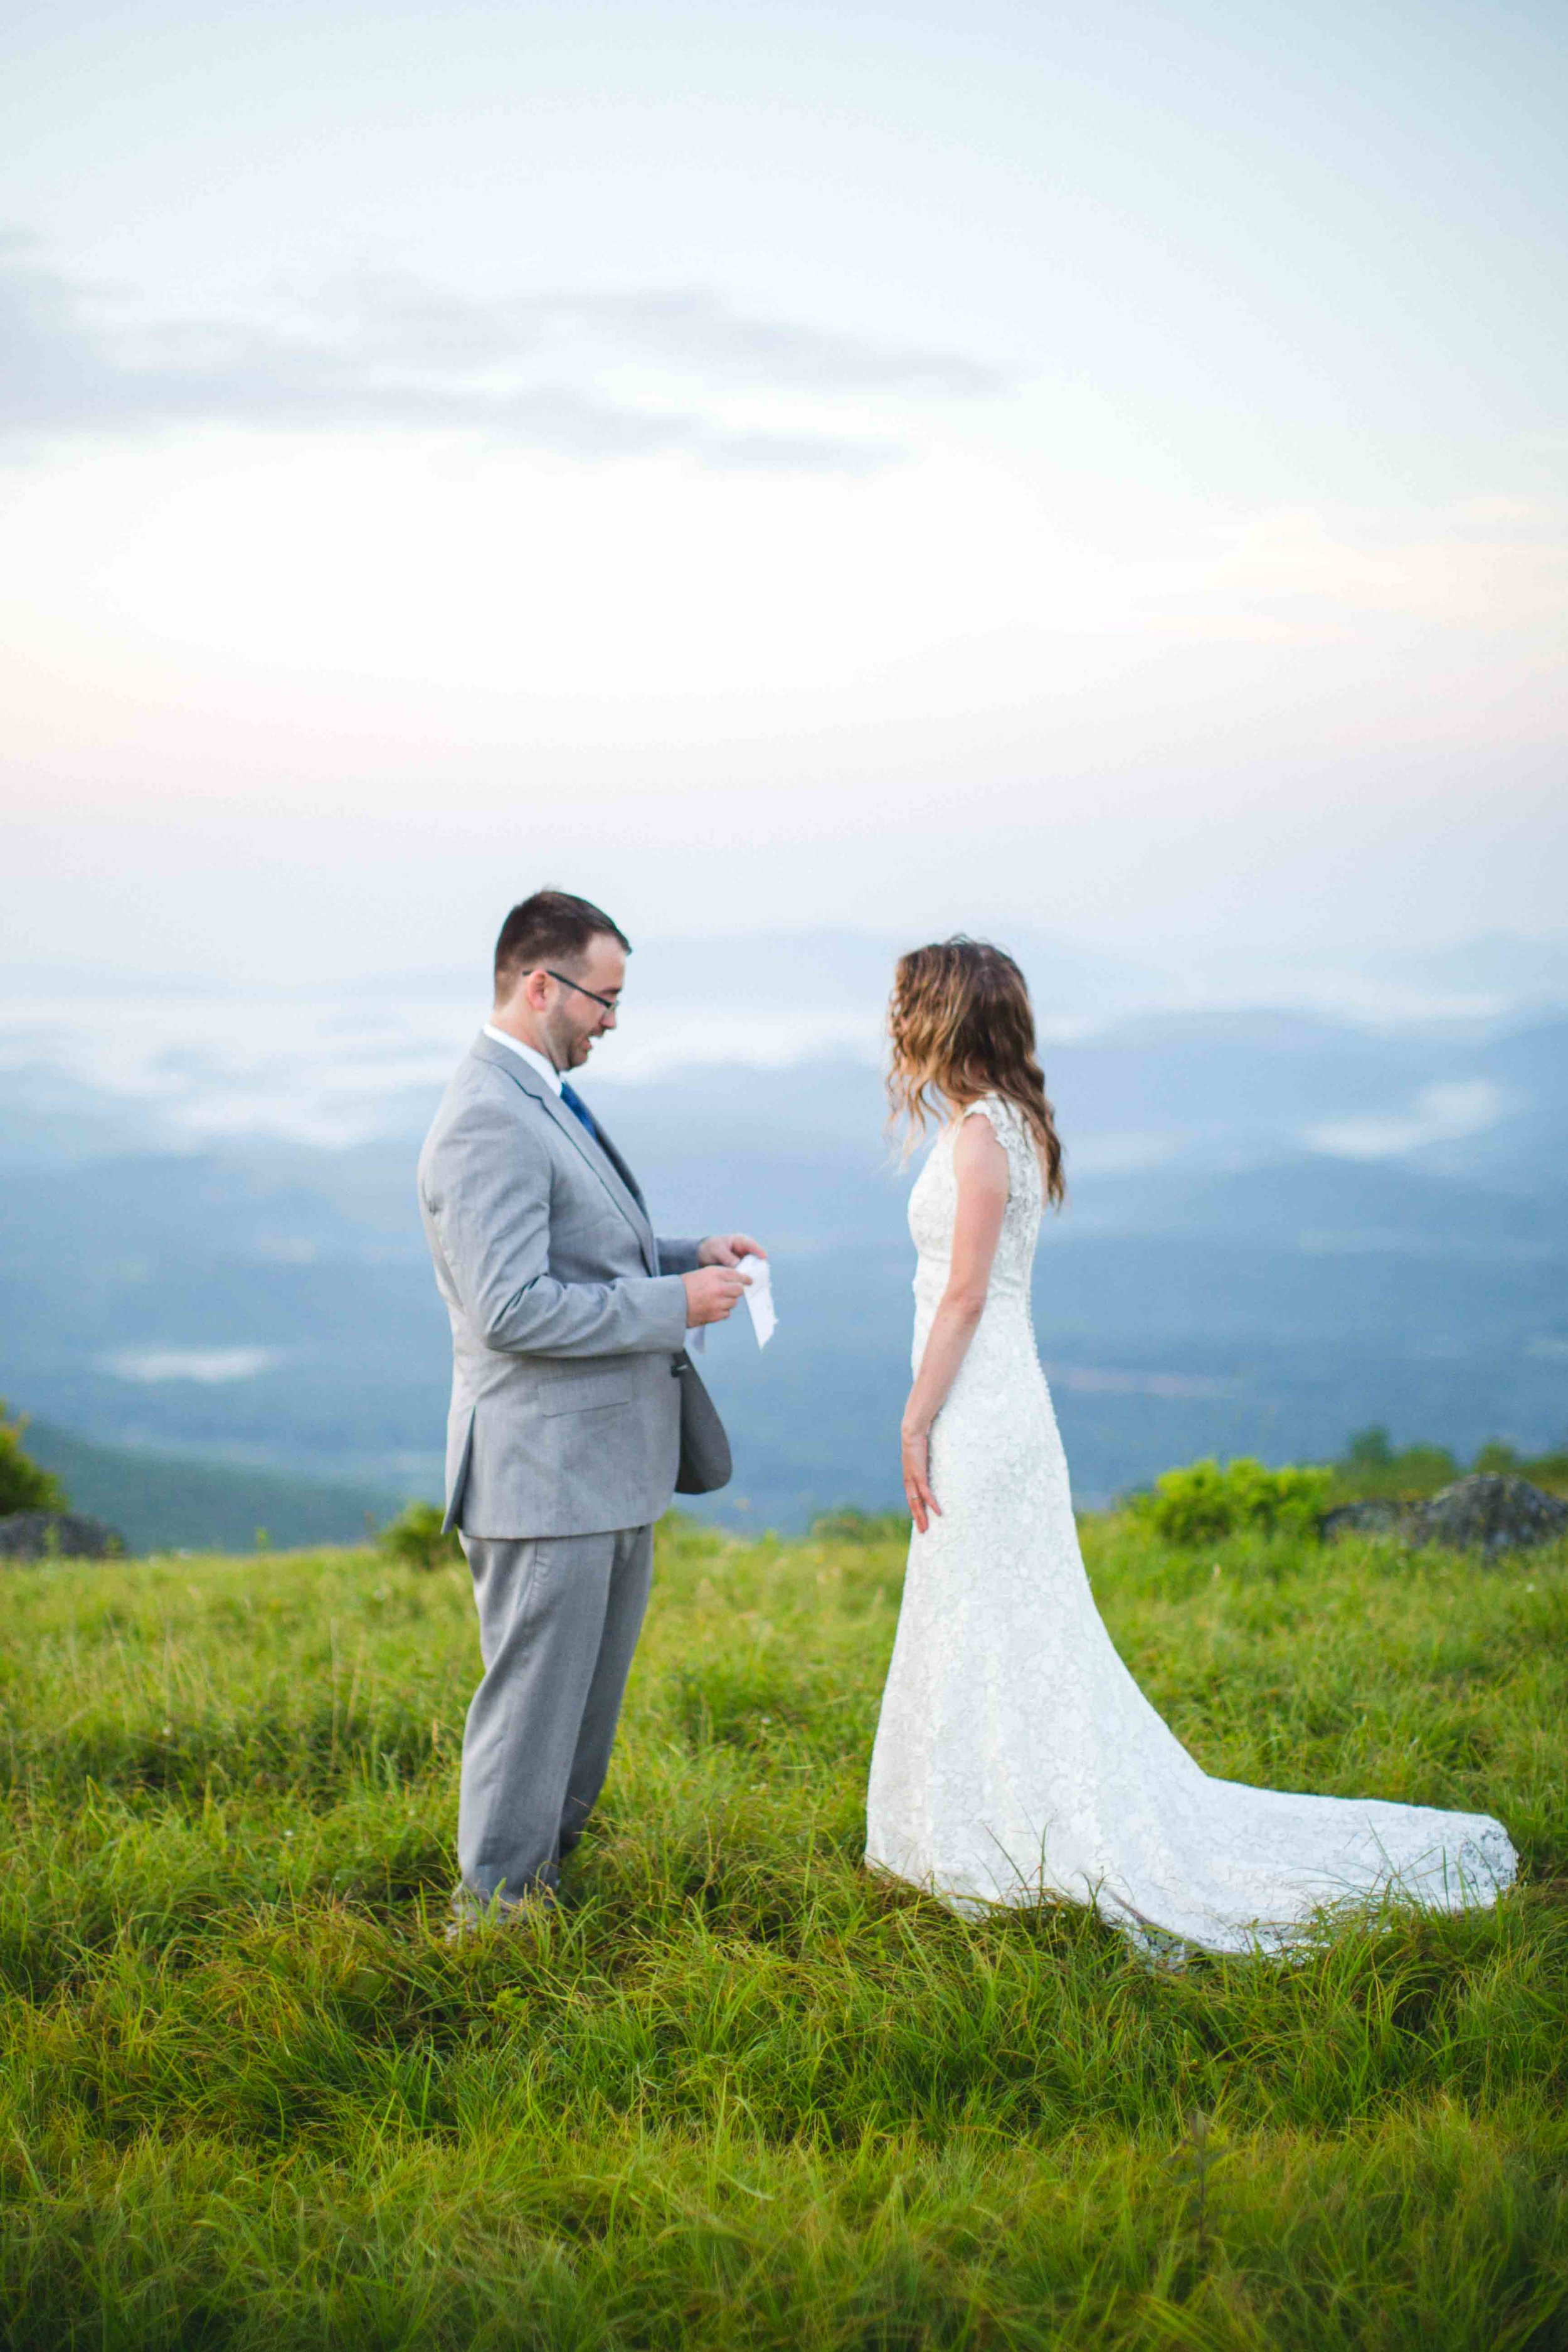 north-carolina-elopement-photographer-25.jpg